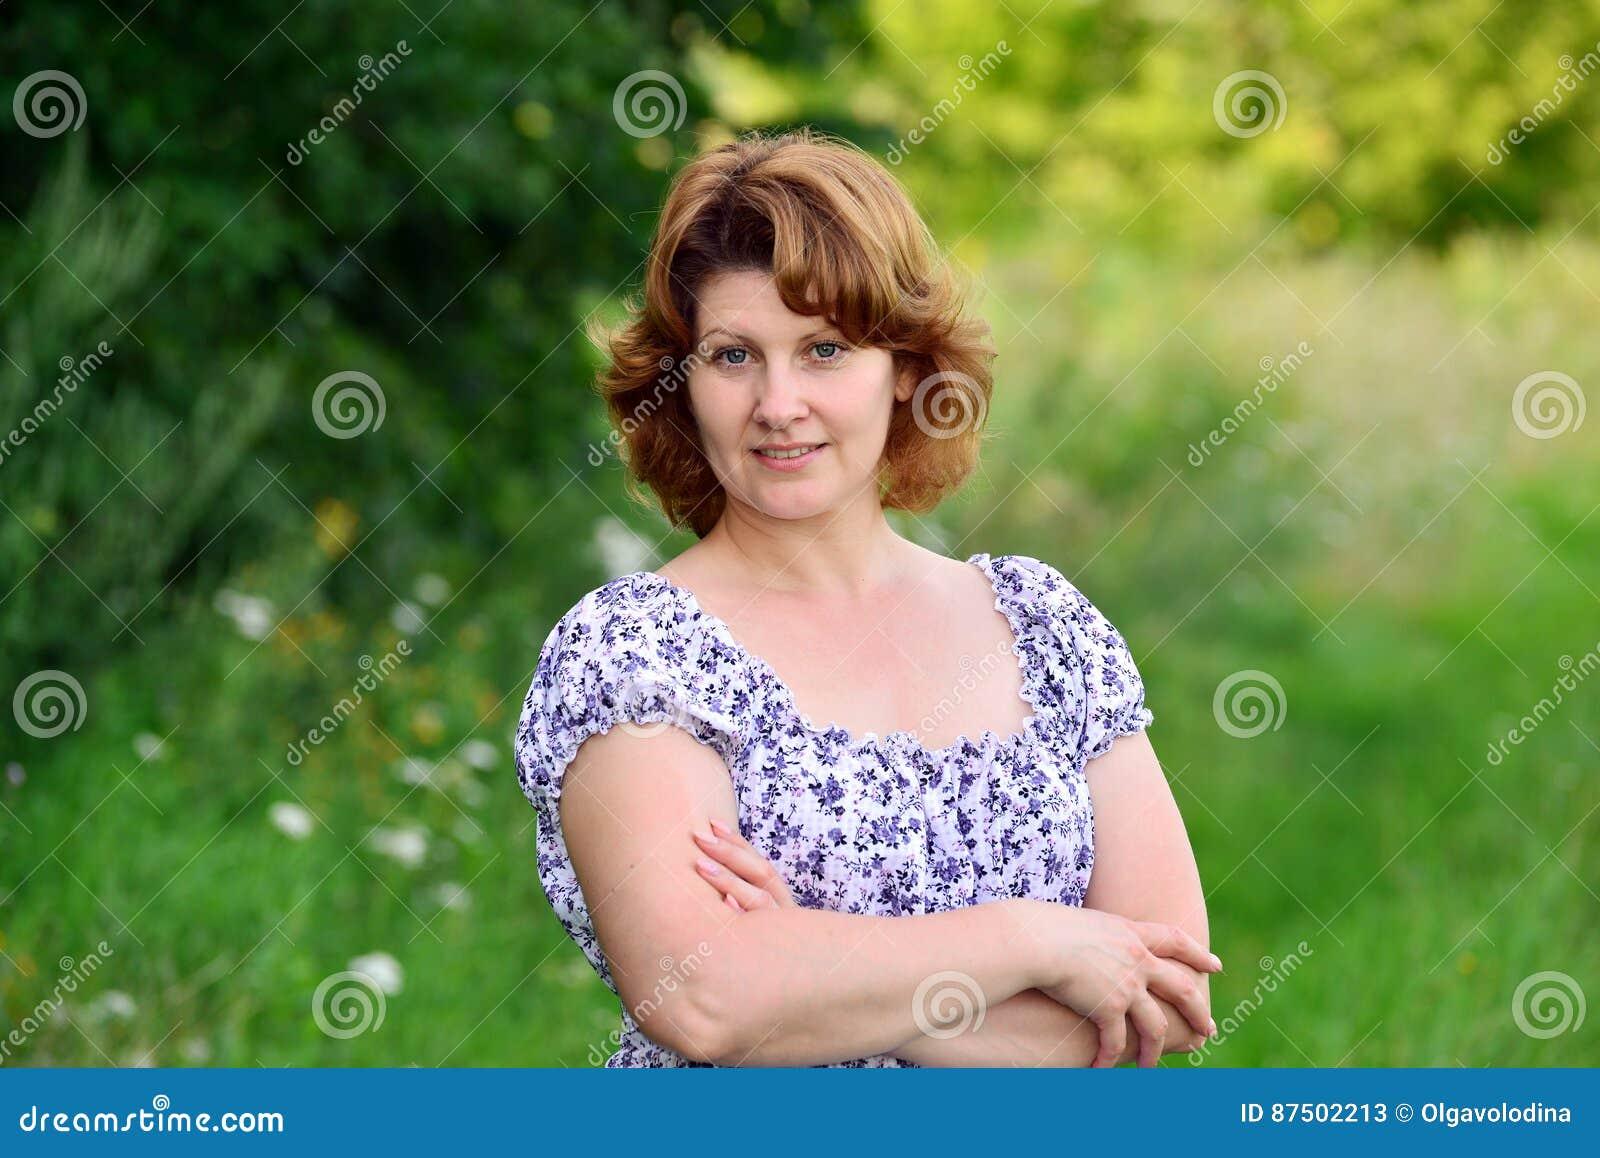 Фото взрослых женщин на природе фото 788-811